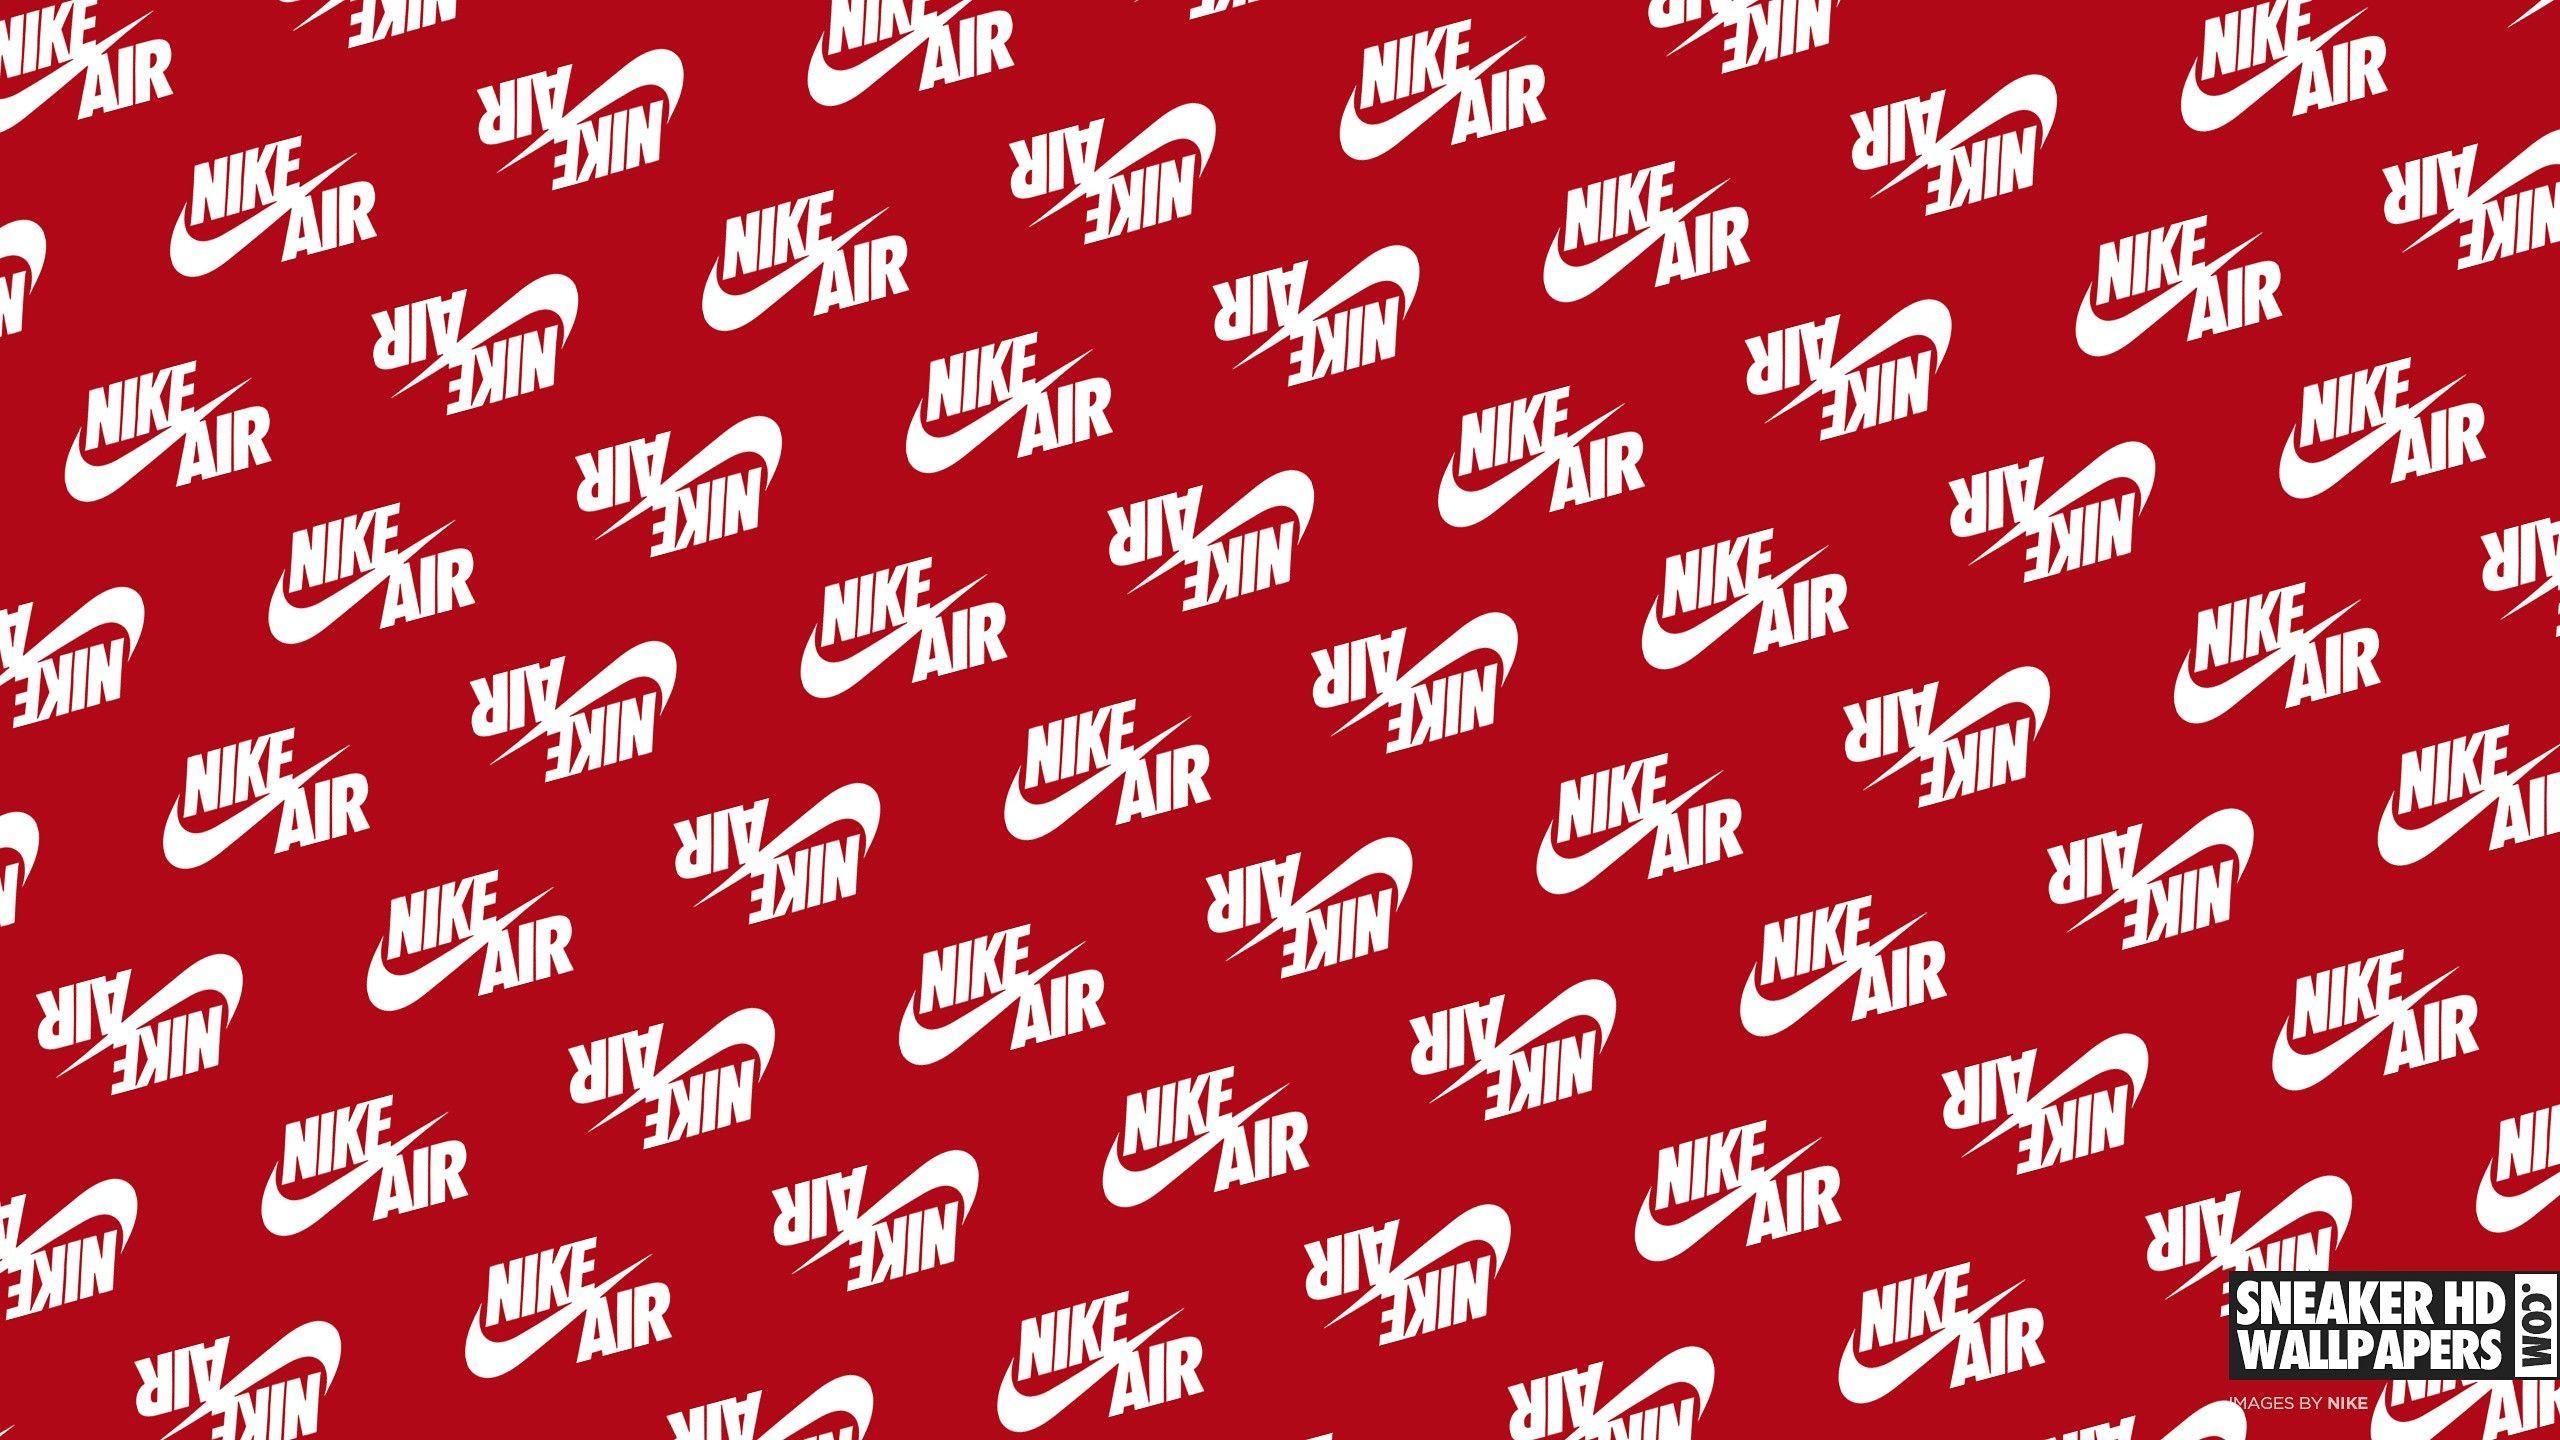 Res: 2560x1440, IPhone Nike Wallpaper HD 78+ - xshyfc.com